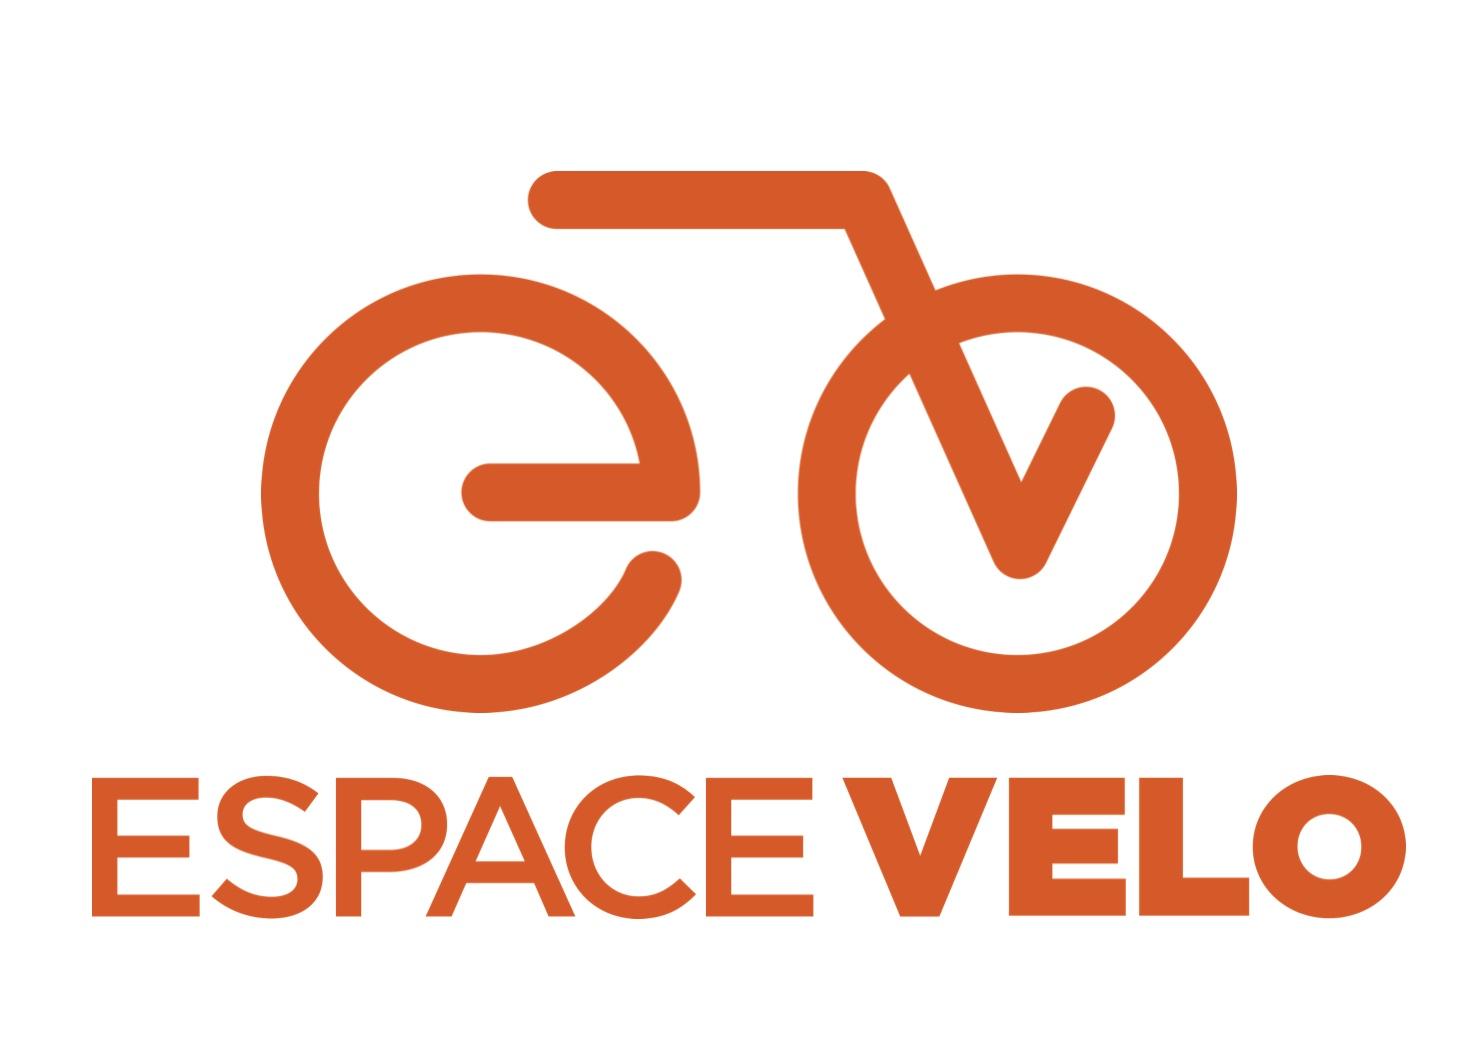 Espace vélo